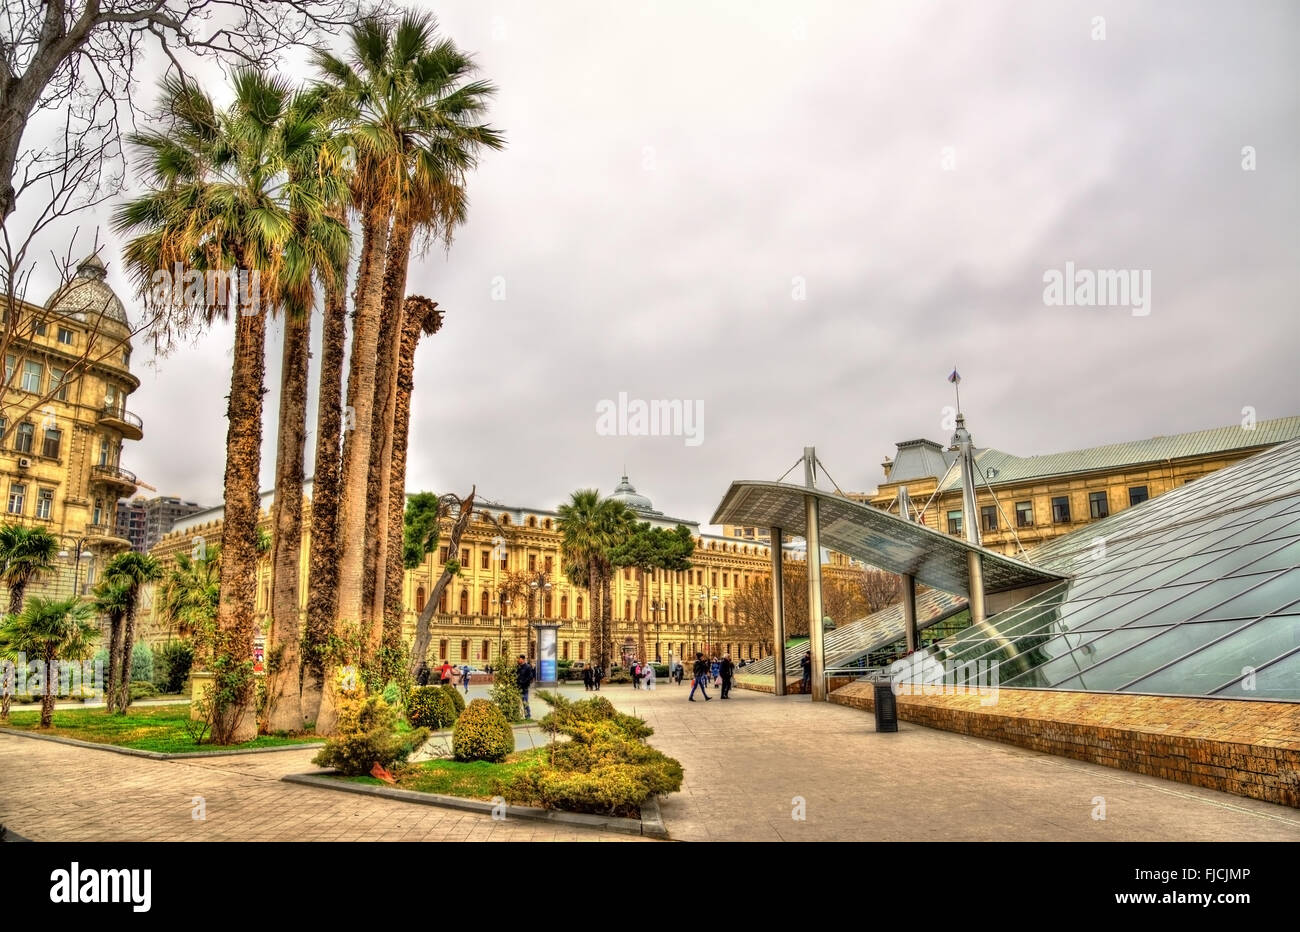 Exit from Icheri Sheher metro station in Baku - Stock Image